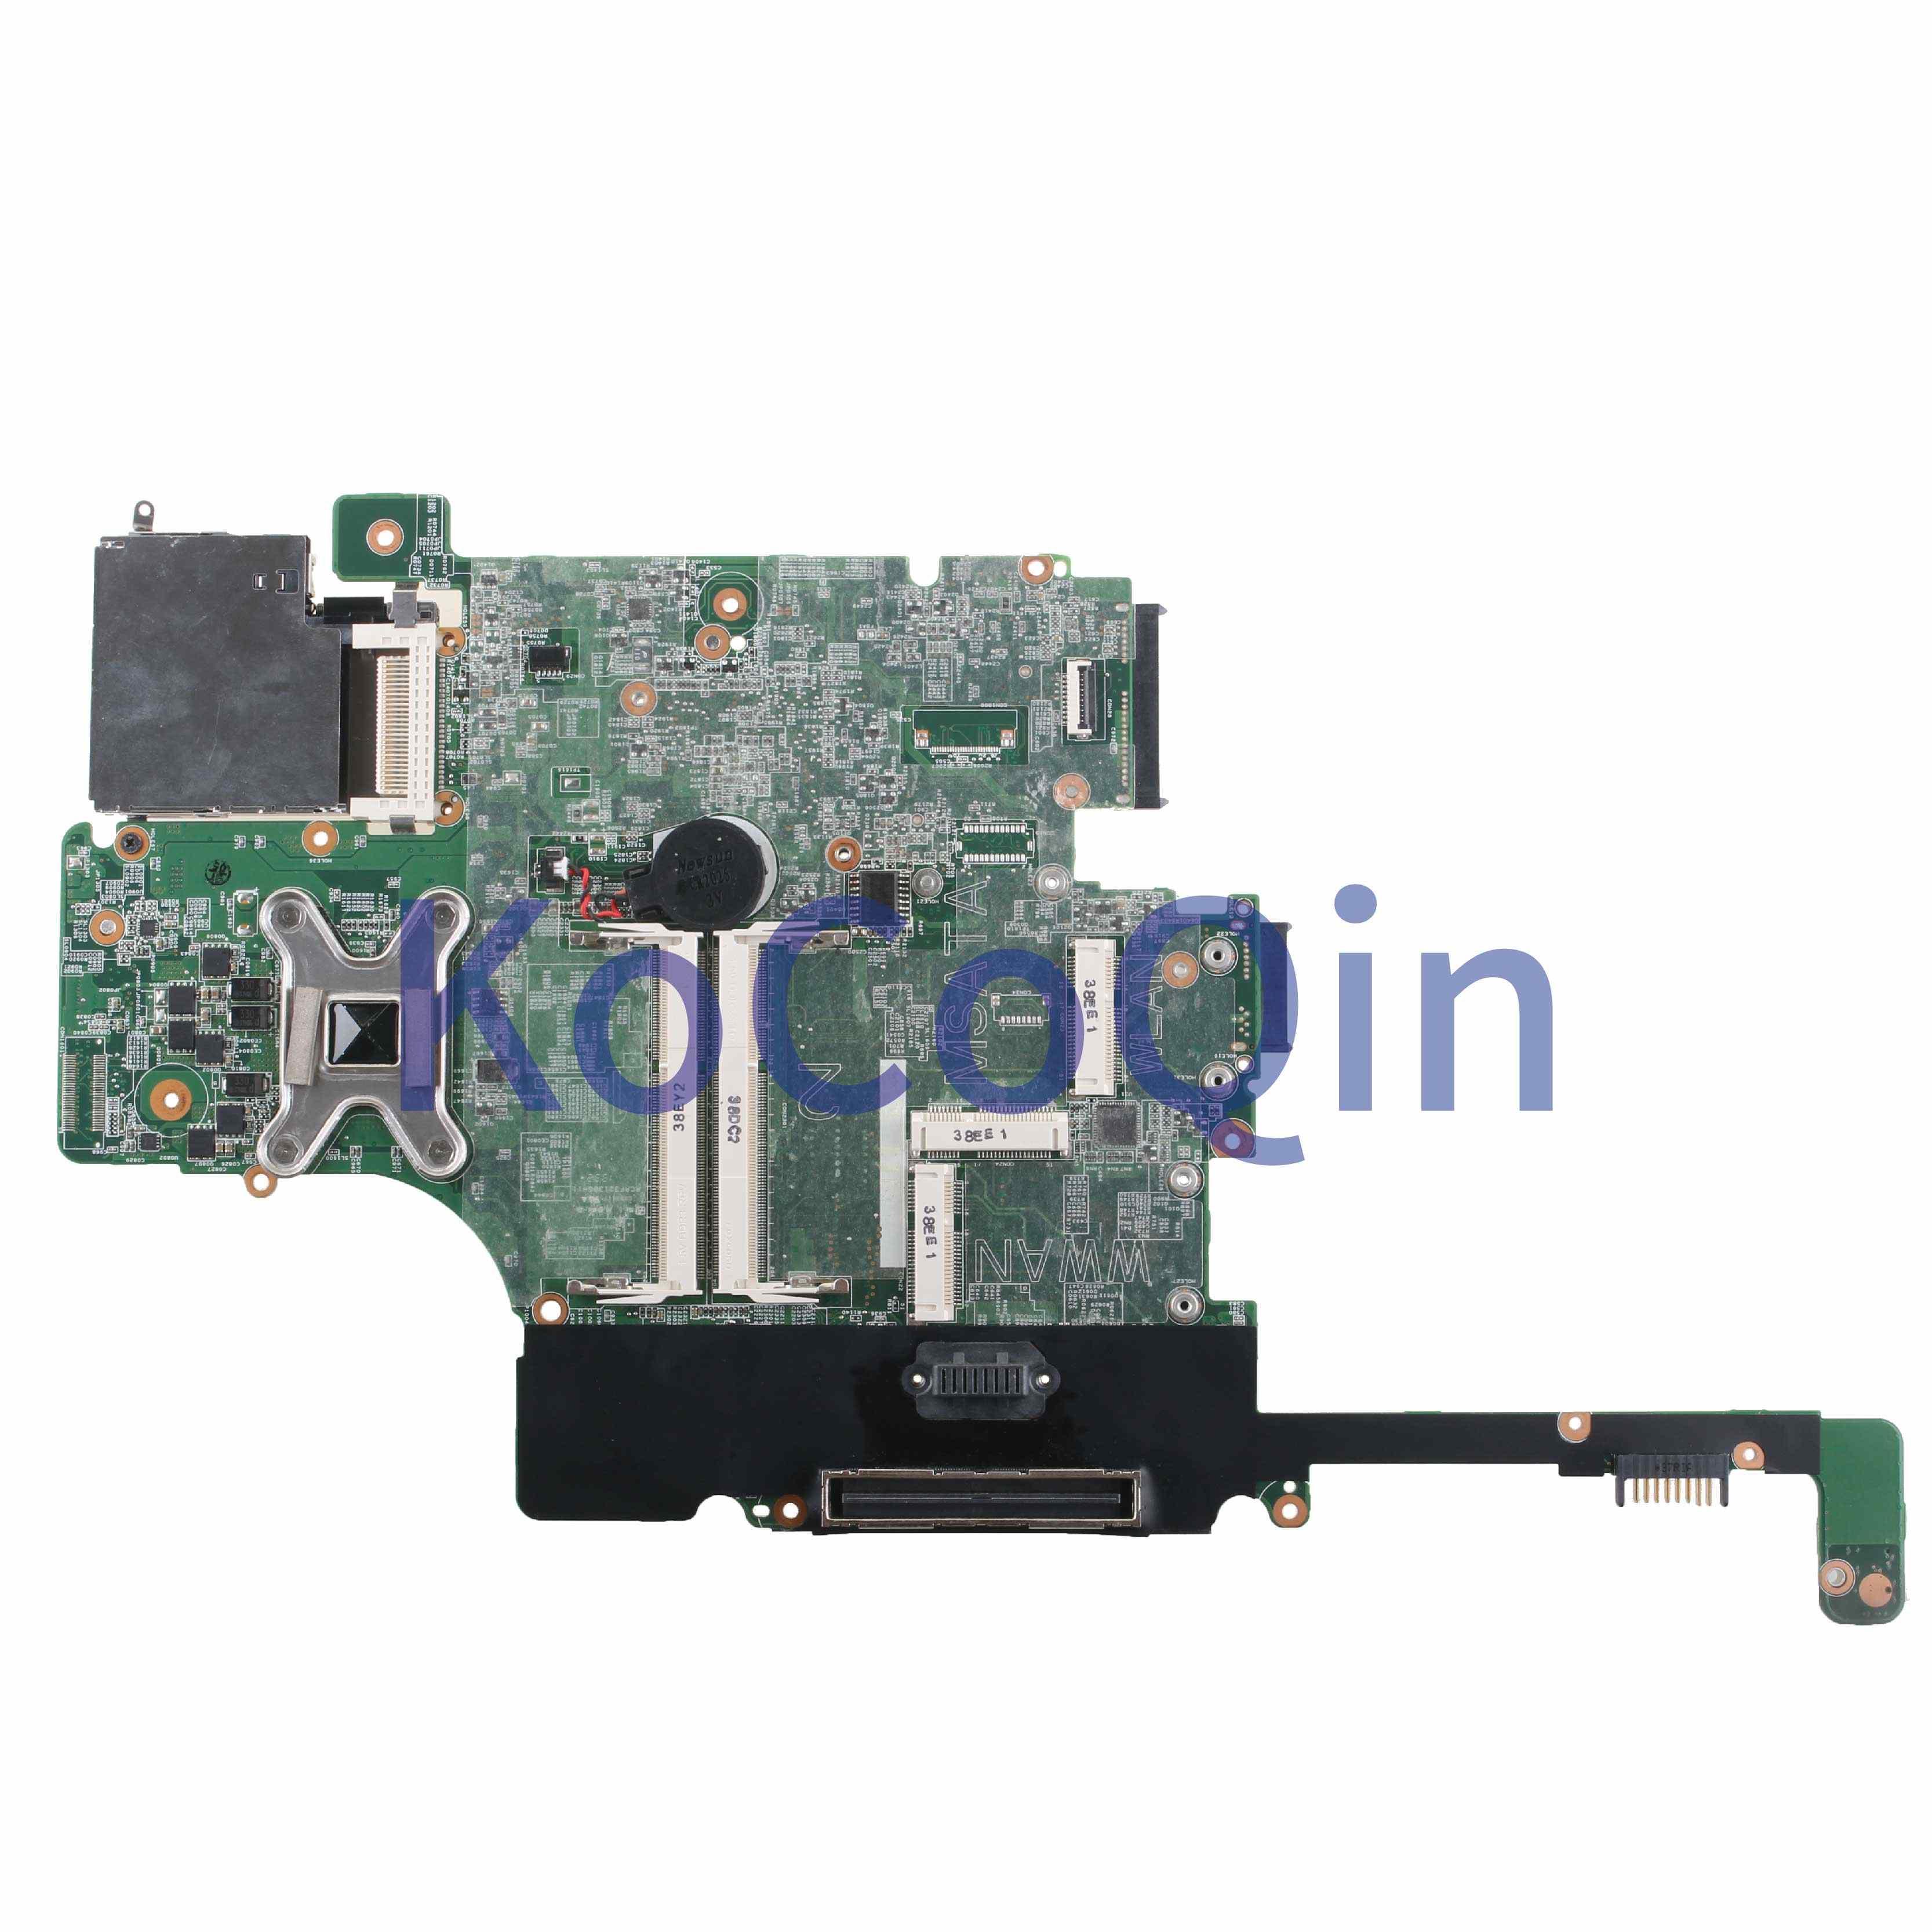 KoCoQin האם מחשב נייד עבור HP Elitebook 8570W 4 ram חריץ Core SLJ8A Mainboard 690643-001 690643-601 695956-001 010176600